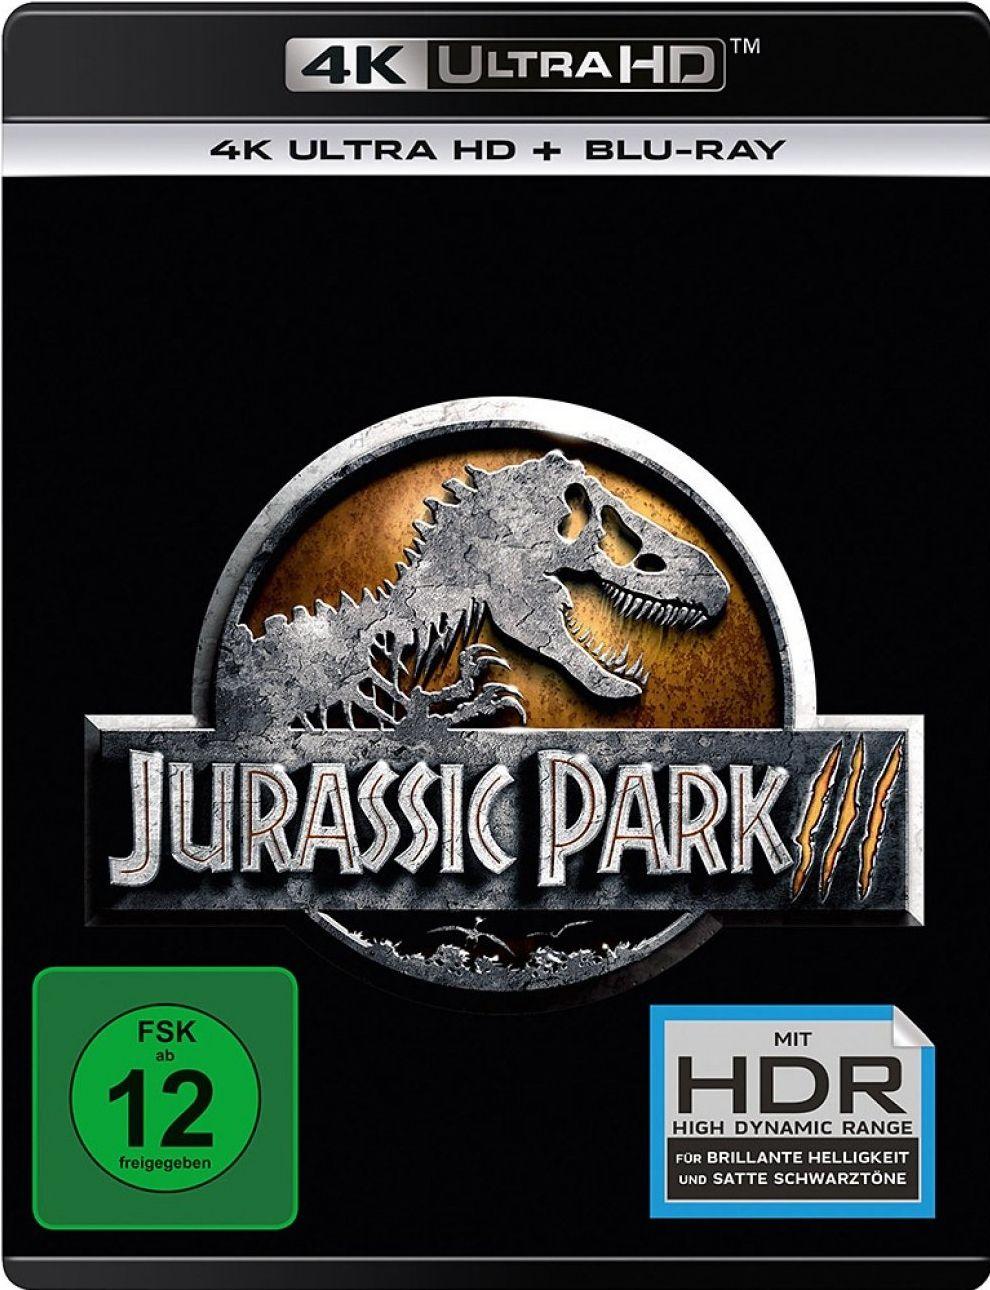 Jurassic Park 3 (2 Discs) (UHD BLURAY + BLURAY)